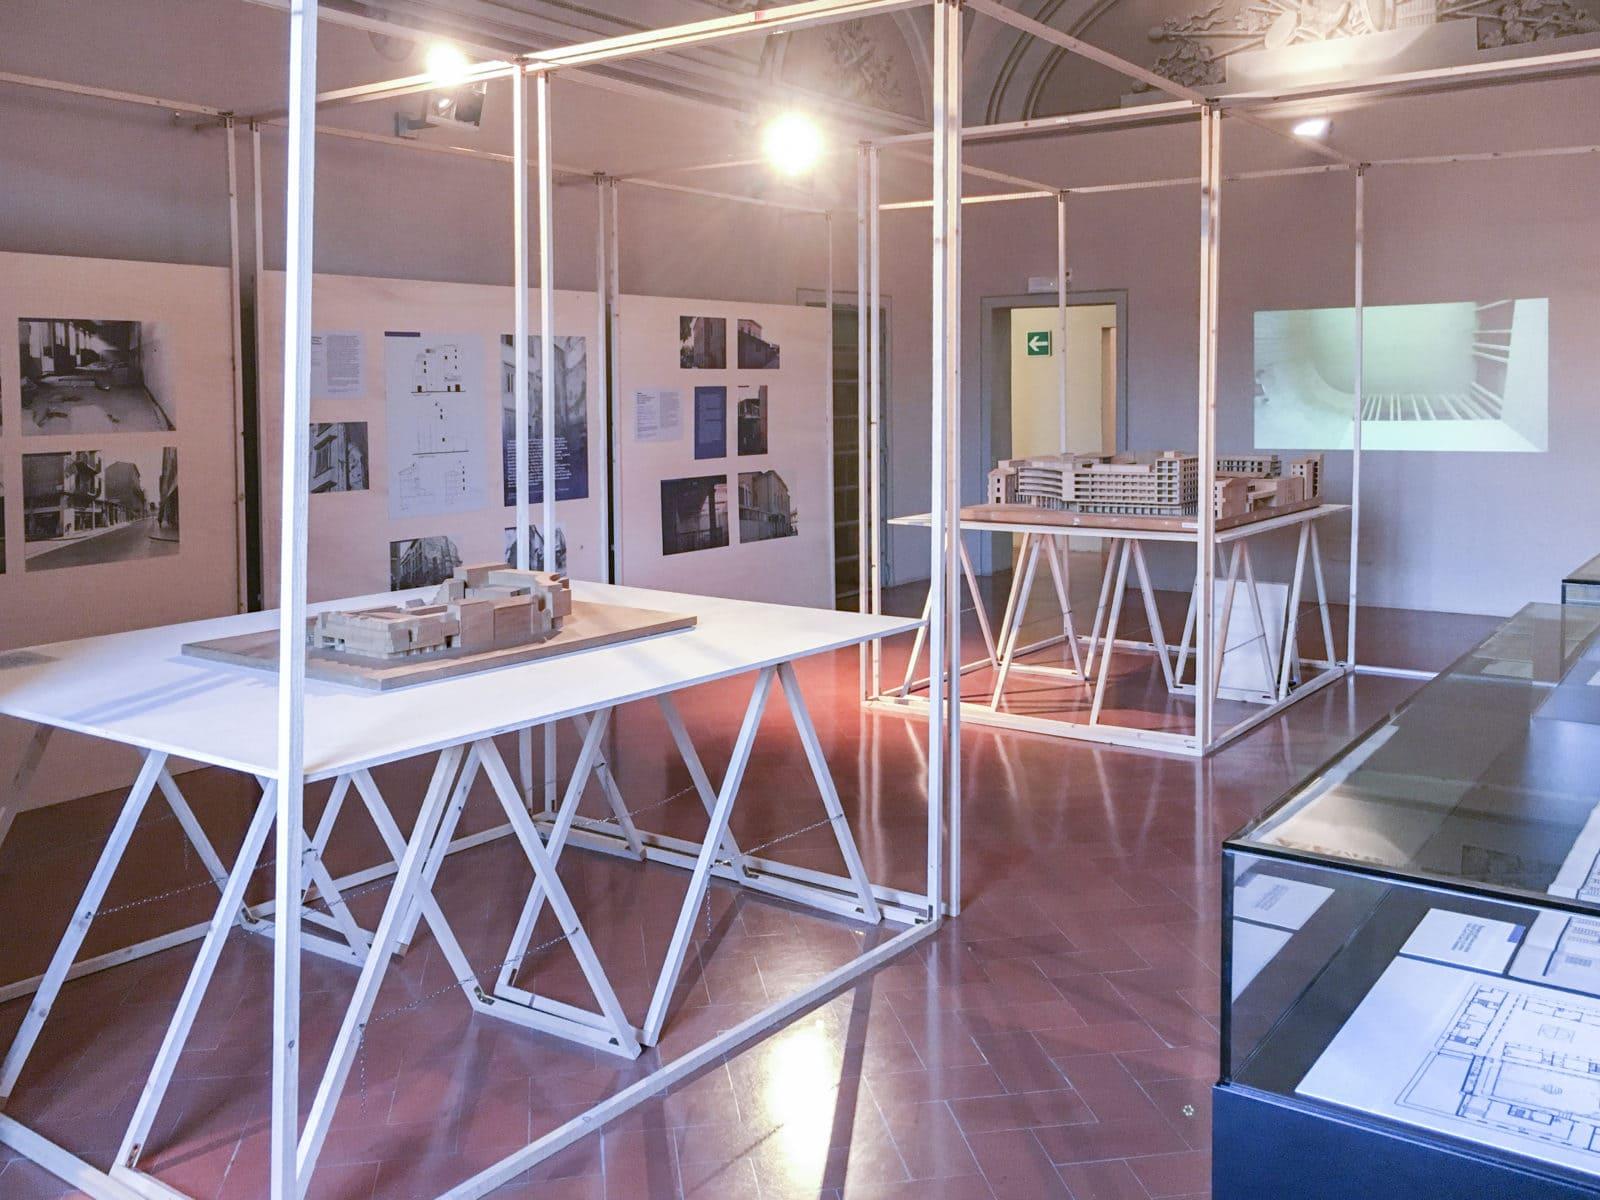 Roberto Mariani Architetto exhibition setup